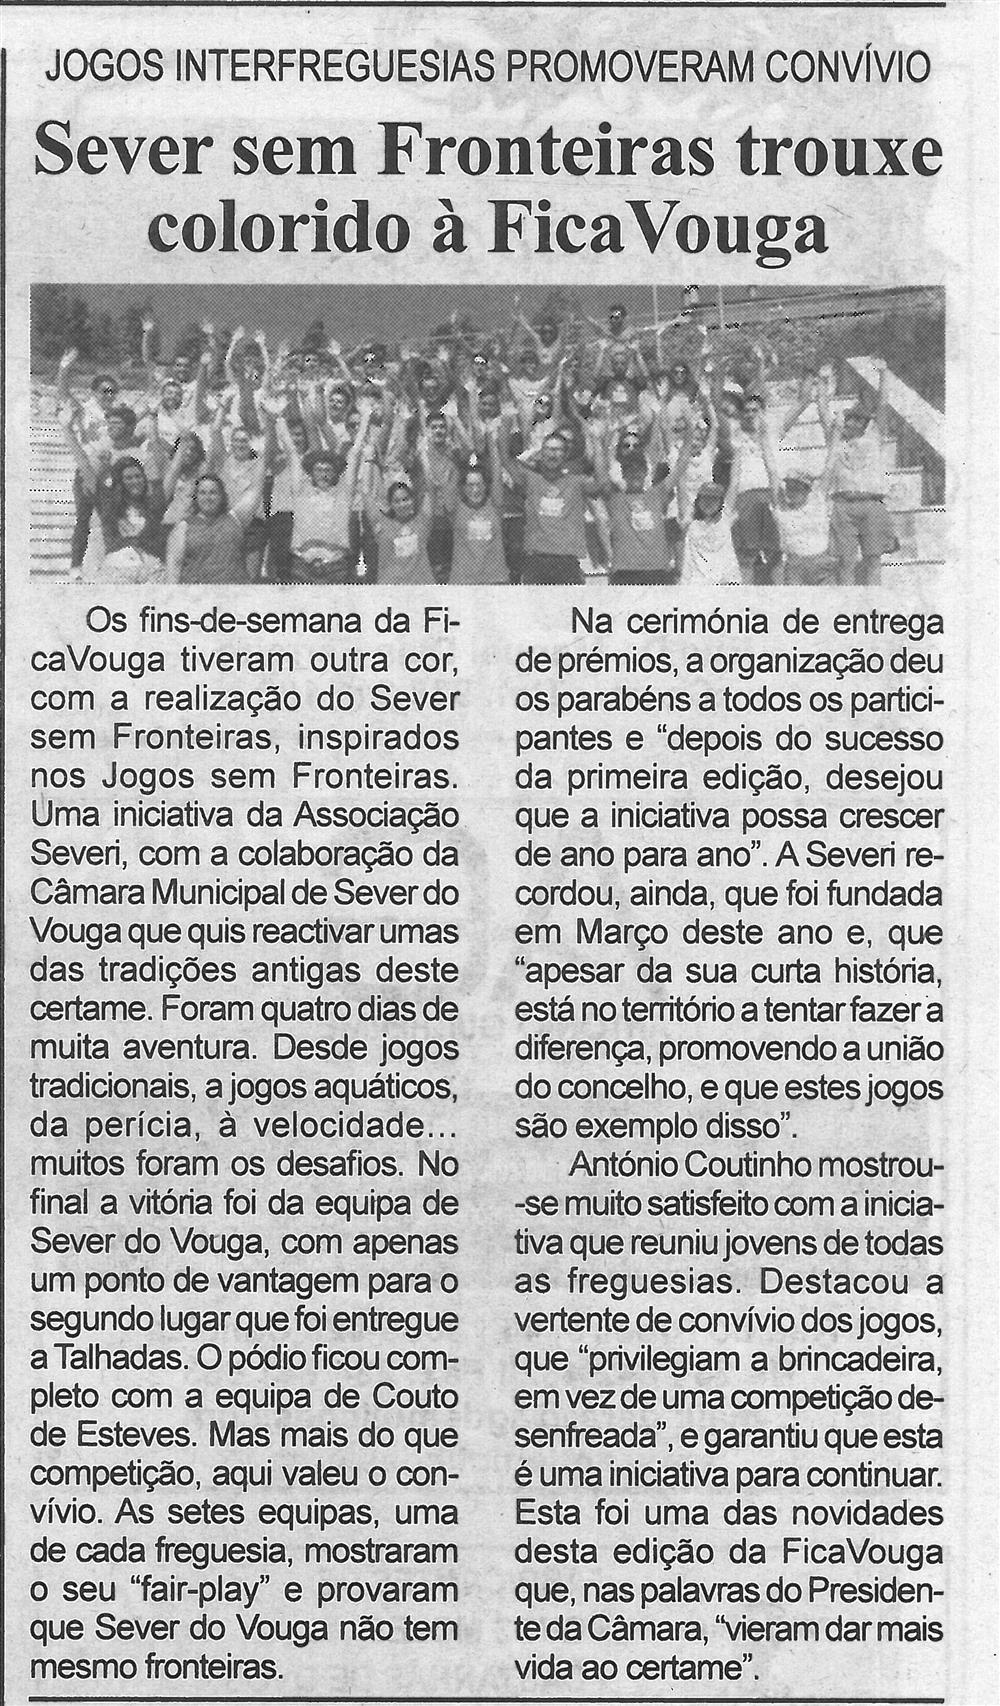 BV-1.ªago.'17-p.7-Sever Sem Fronteiras trouxe colorido à FicaVouga : jogos interfreguesias promoveram convívio.jpg